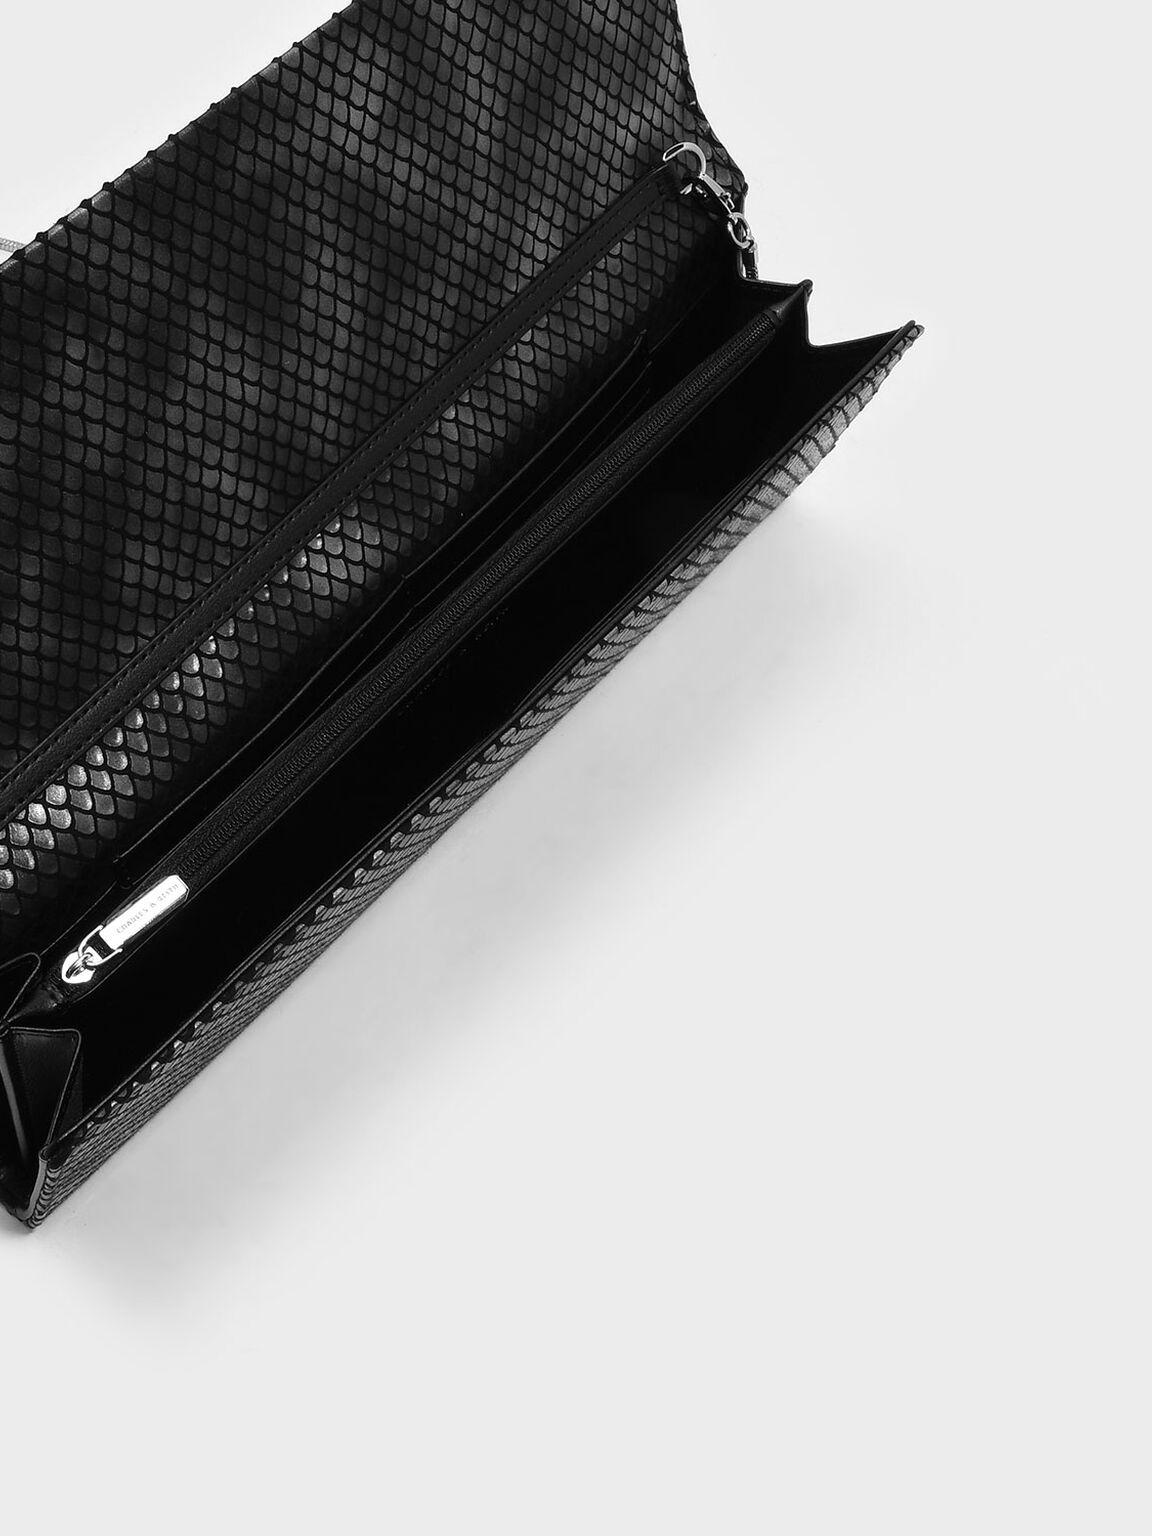 Basic Front Flap Clutch, Black2, hi-res